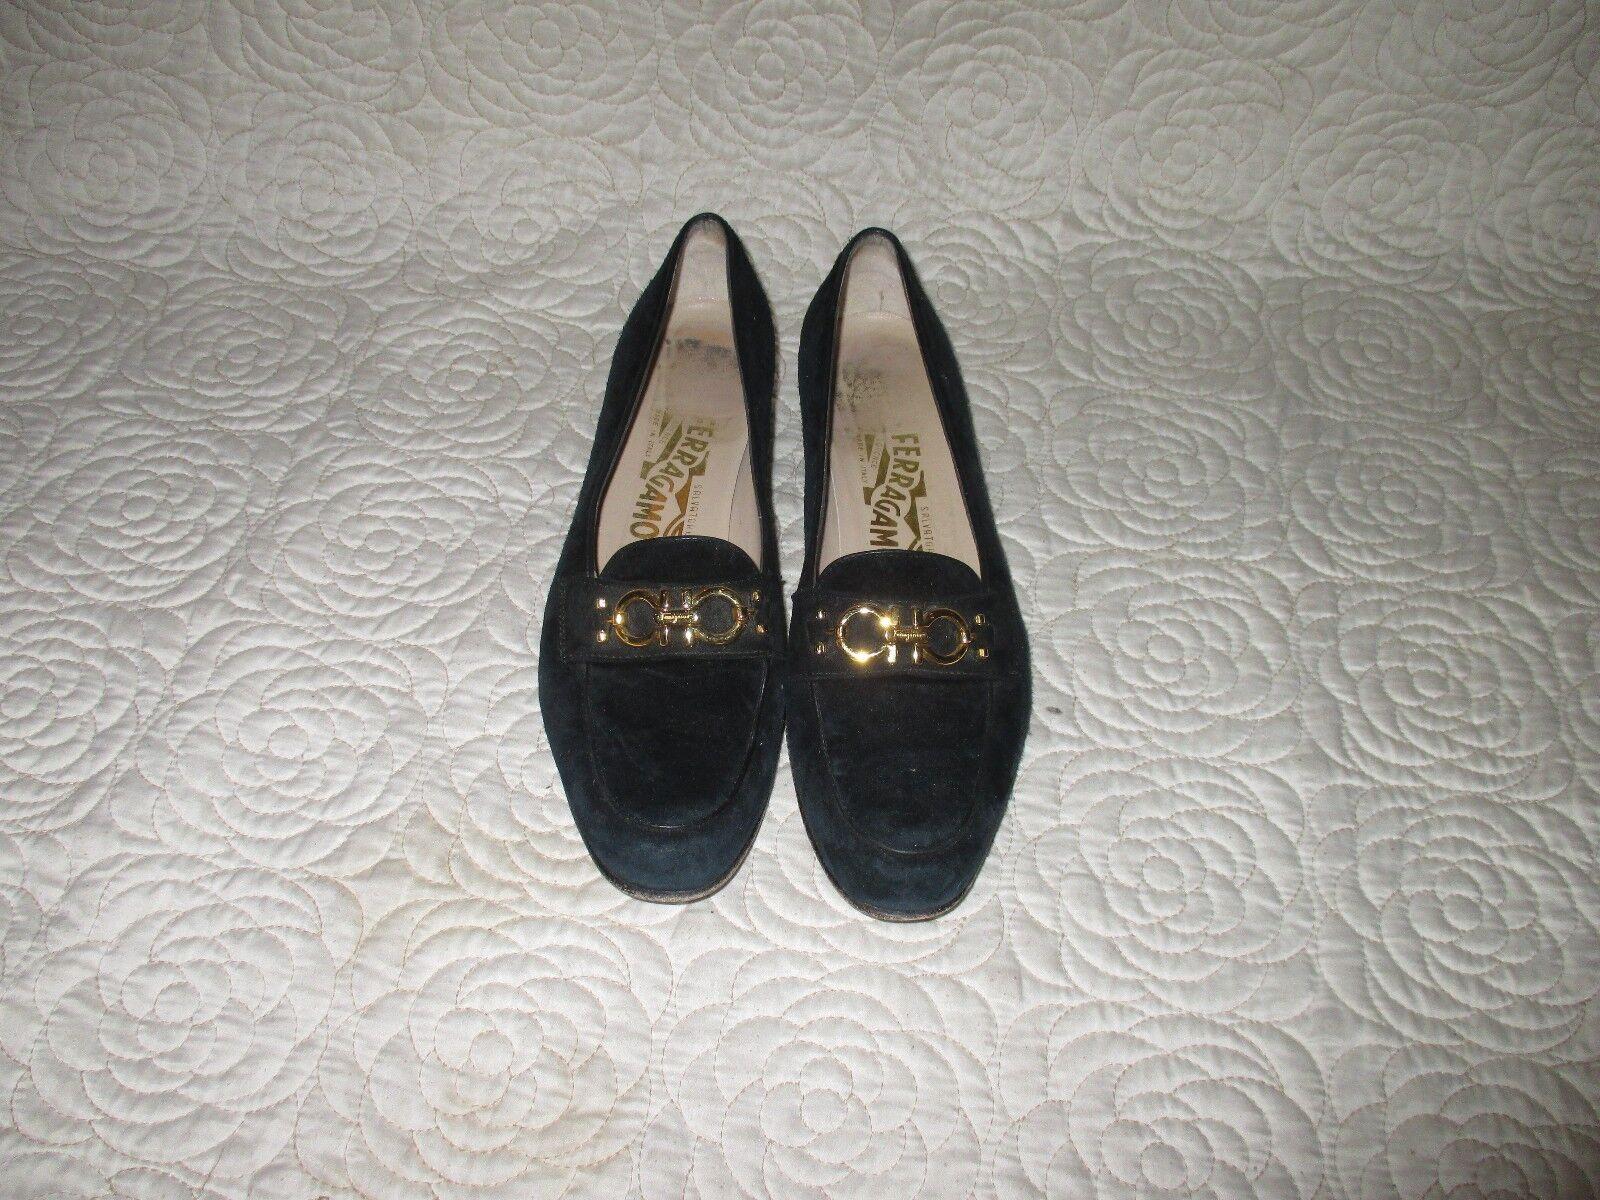 SALVATORE FERRAGAMO - black Suede leather  Gancini Bit Loafers  8.5 AAAA